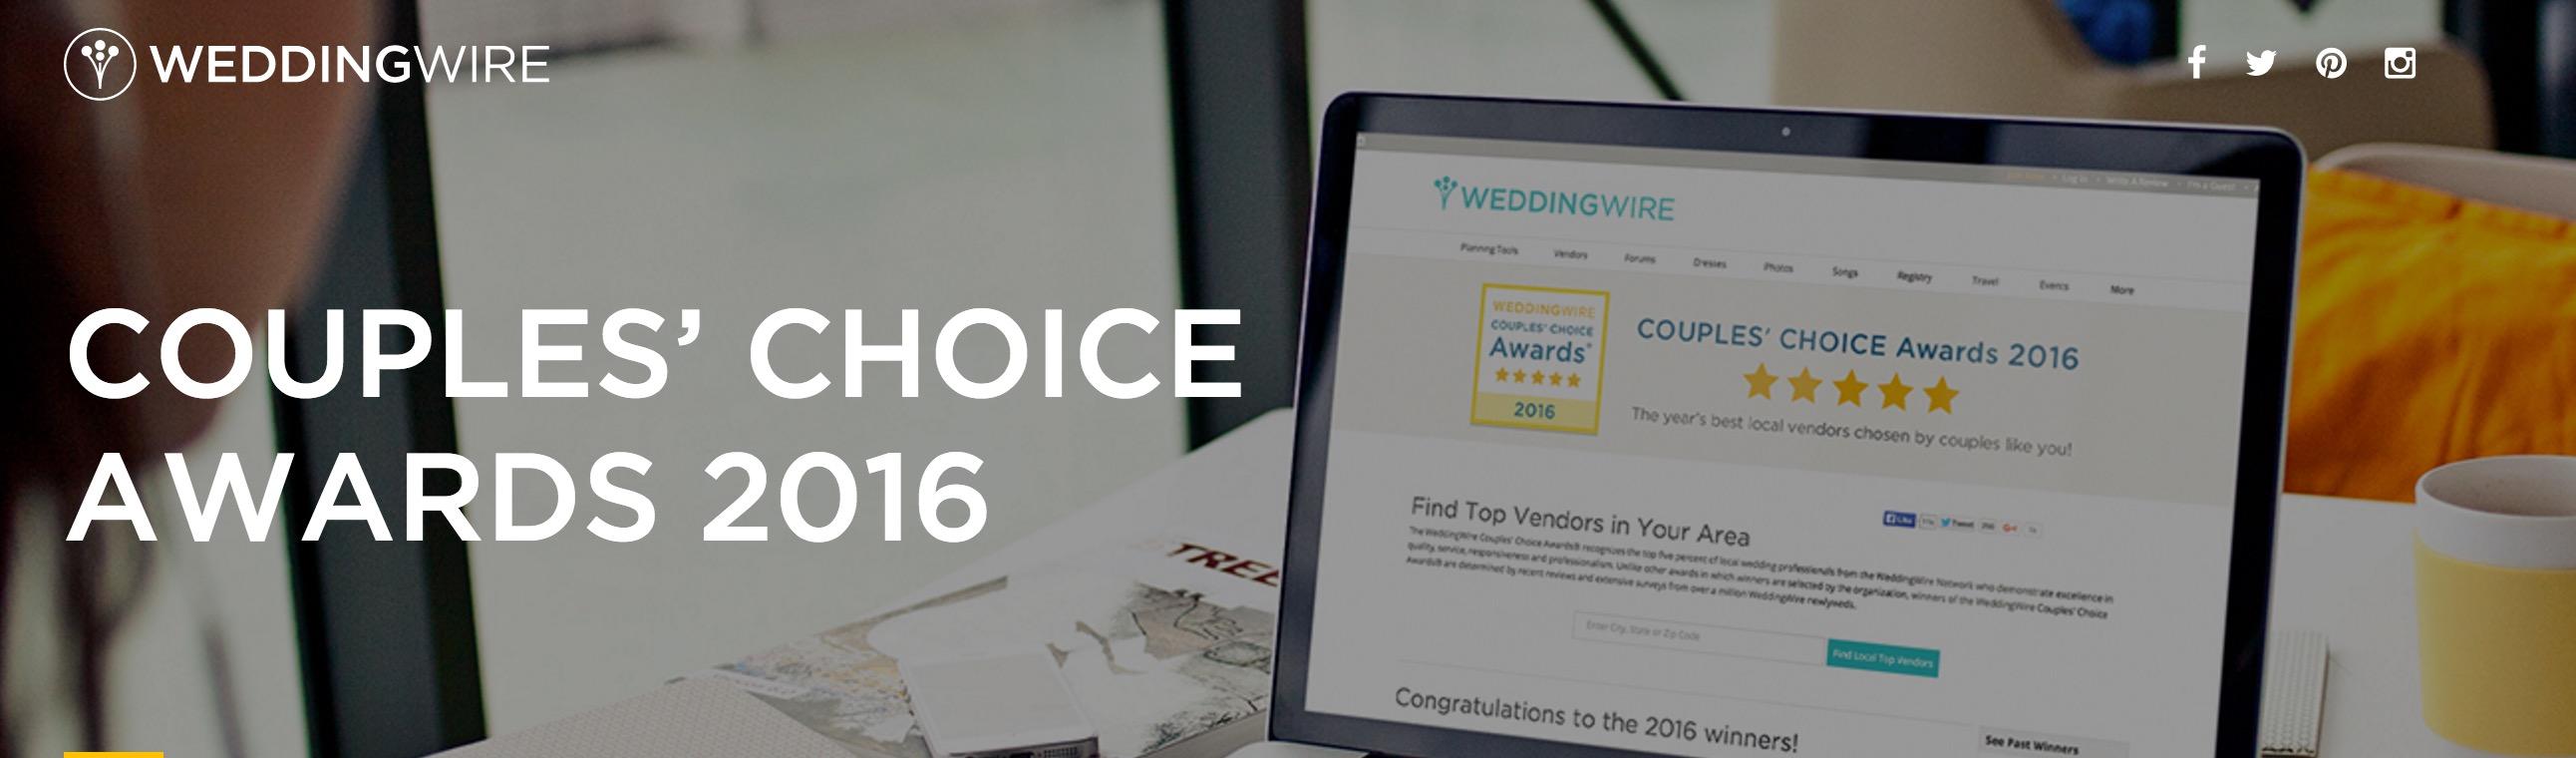 WeddingWire Couple's Choice 2016 - Caladesi Steel Band